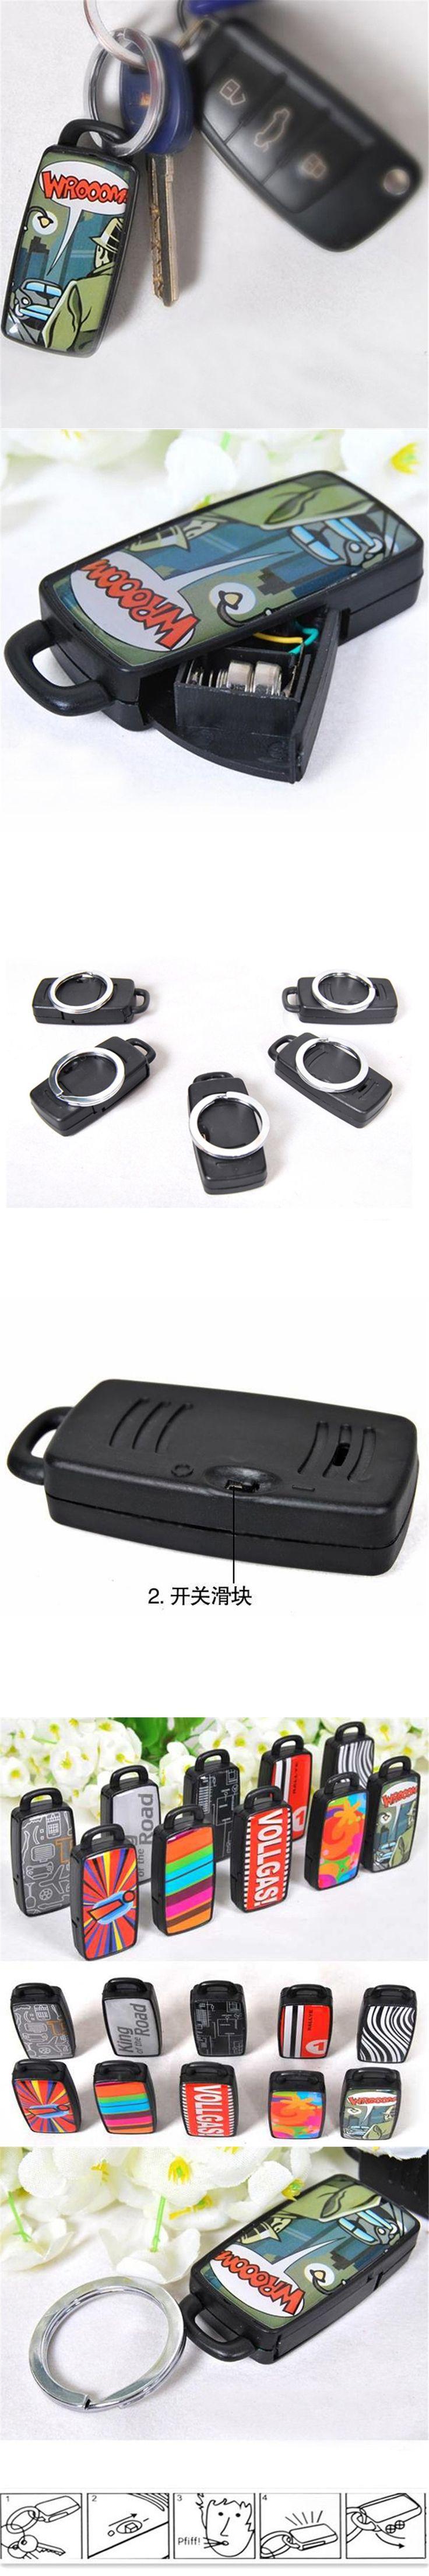 HLEST 1pcs Car Key Finder Locator Lost Keys Chain Keyring Whistle Sound Seeker Car Keychain Remote